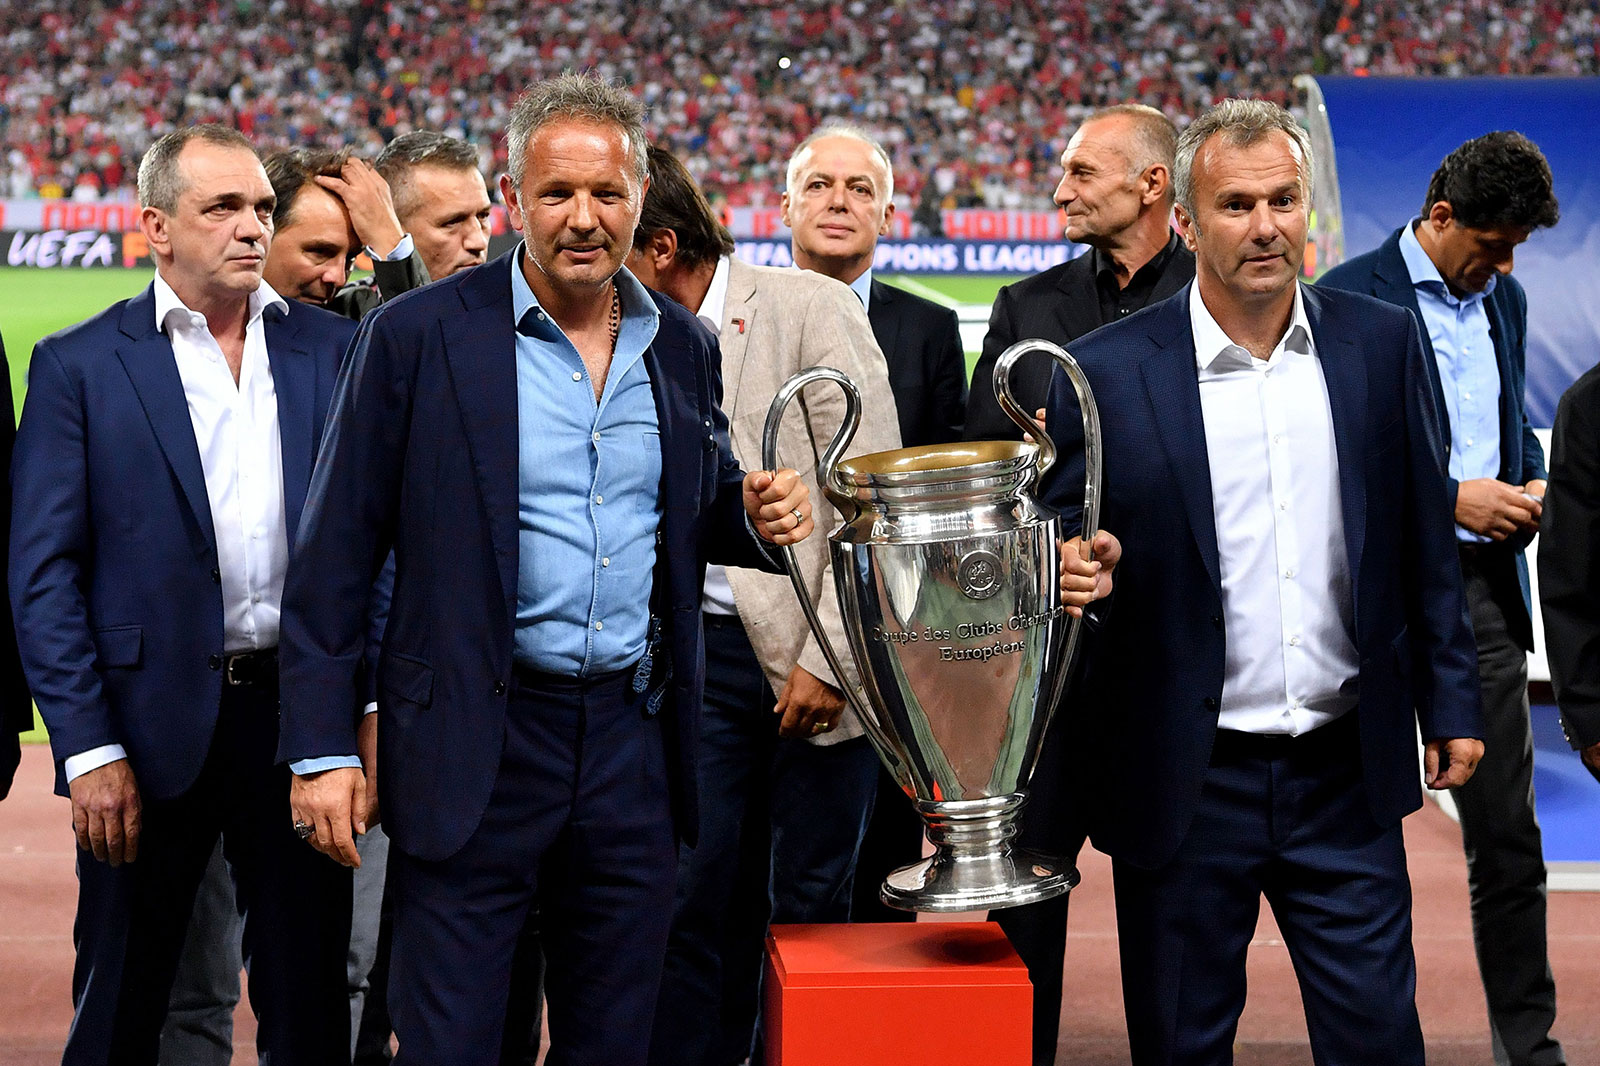 Siniša Mihajlović and Dejan Savićević with a replica of the Champions League trophy before Red Star Belgrade-Napoli at Rajko Mitić Stadium on September 18, 2018. (ANDREJ ISAKOVIC/AFP/Getty Images)